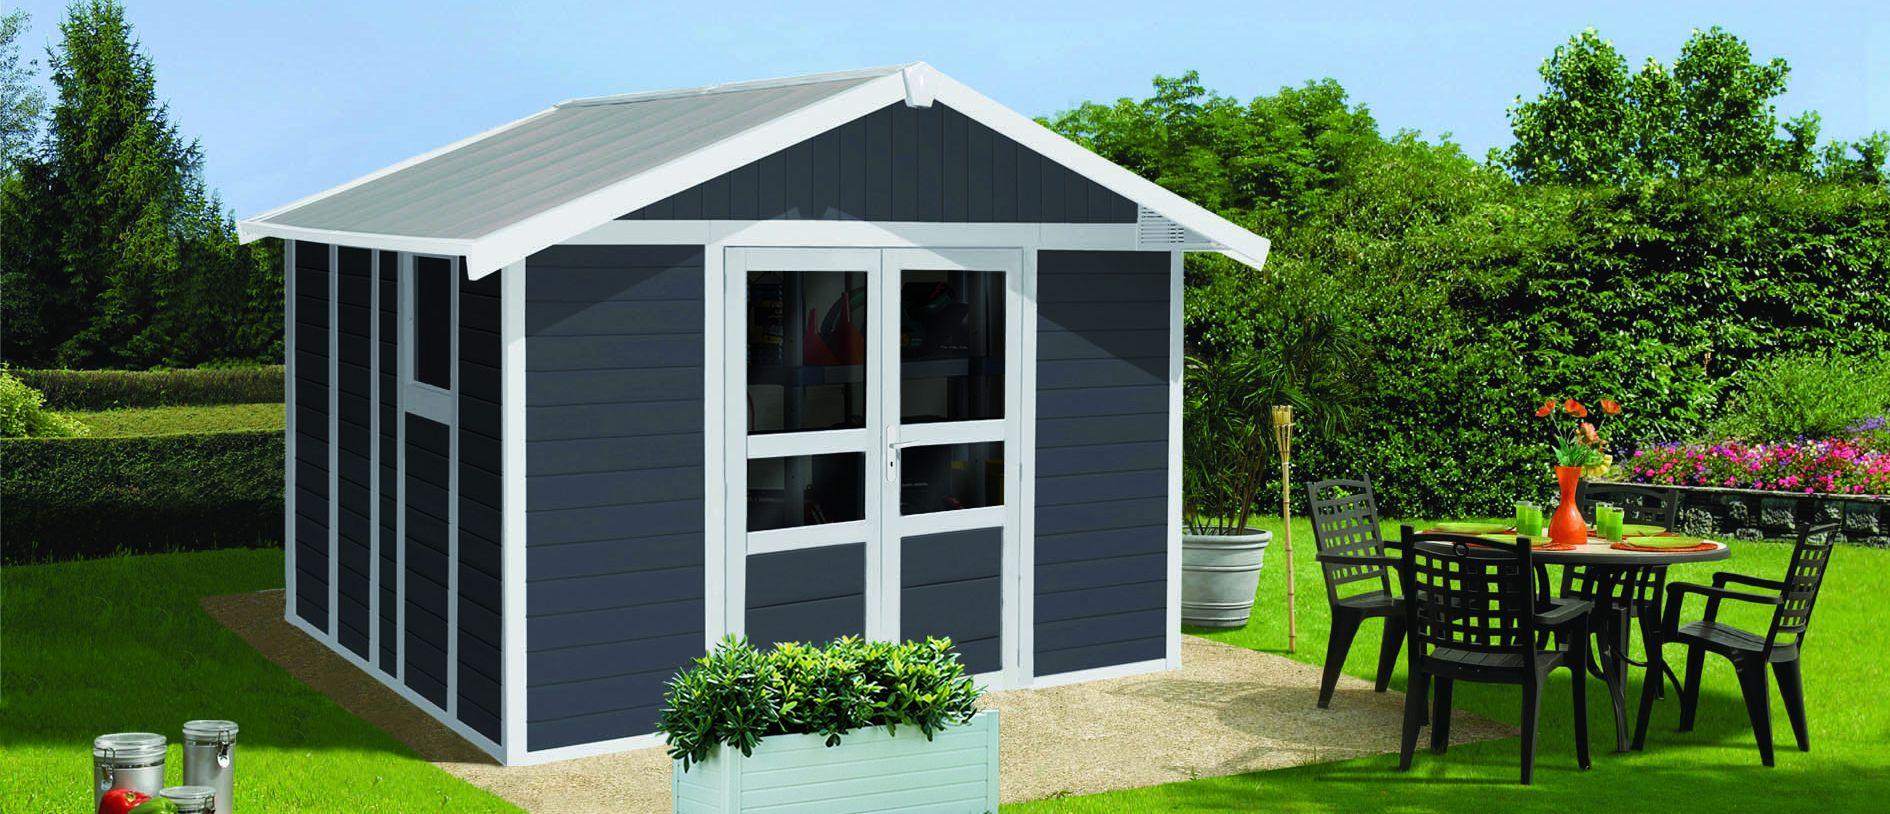 Basic Home Gartenhaus 11 m2 | Grosfillex